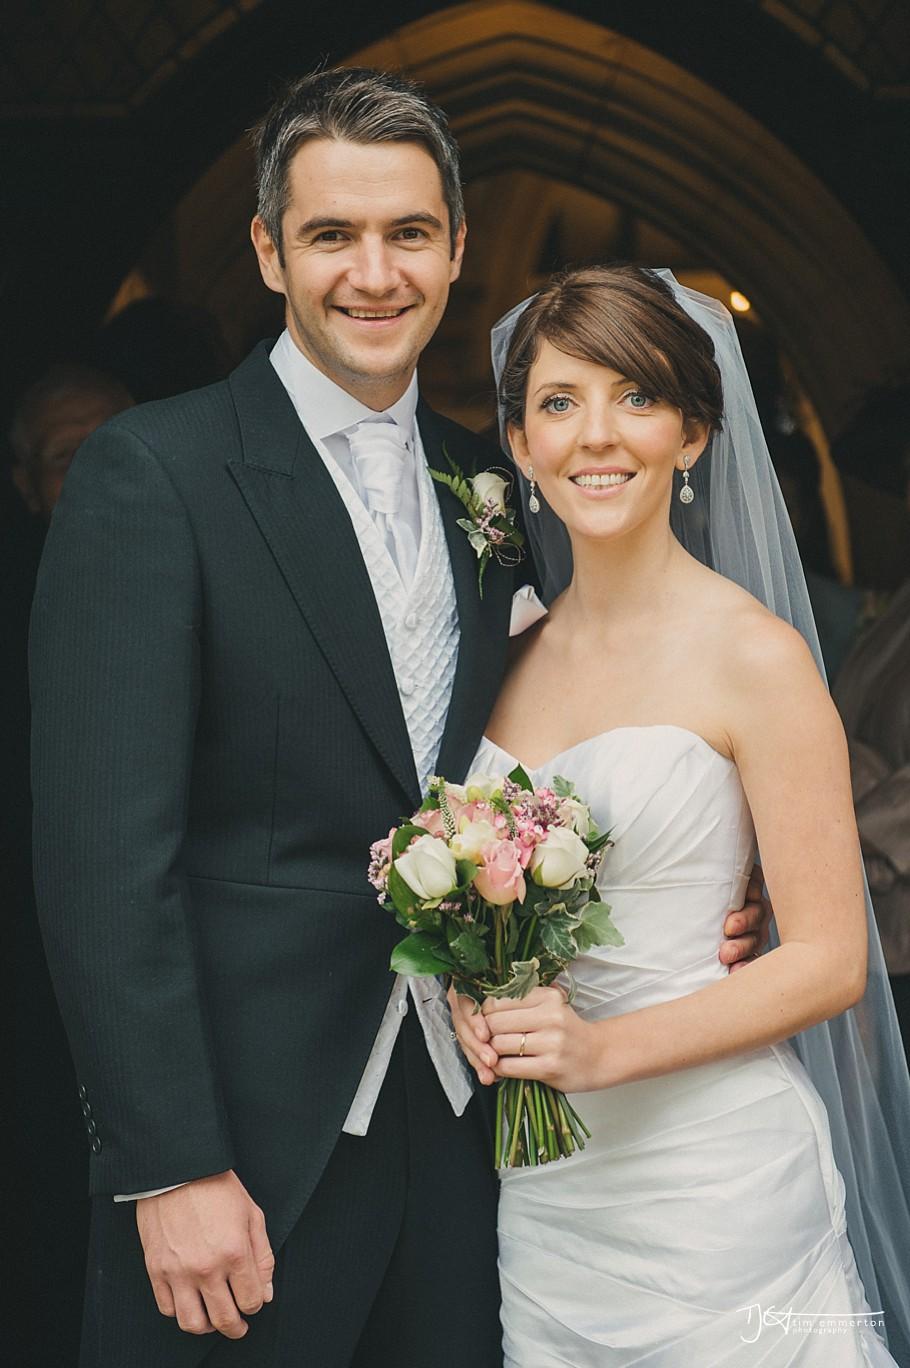 Samlesbury-Hall-Wedding-Photographer-091.jpg